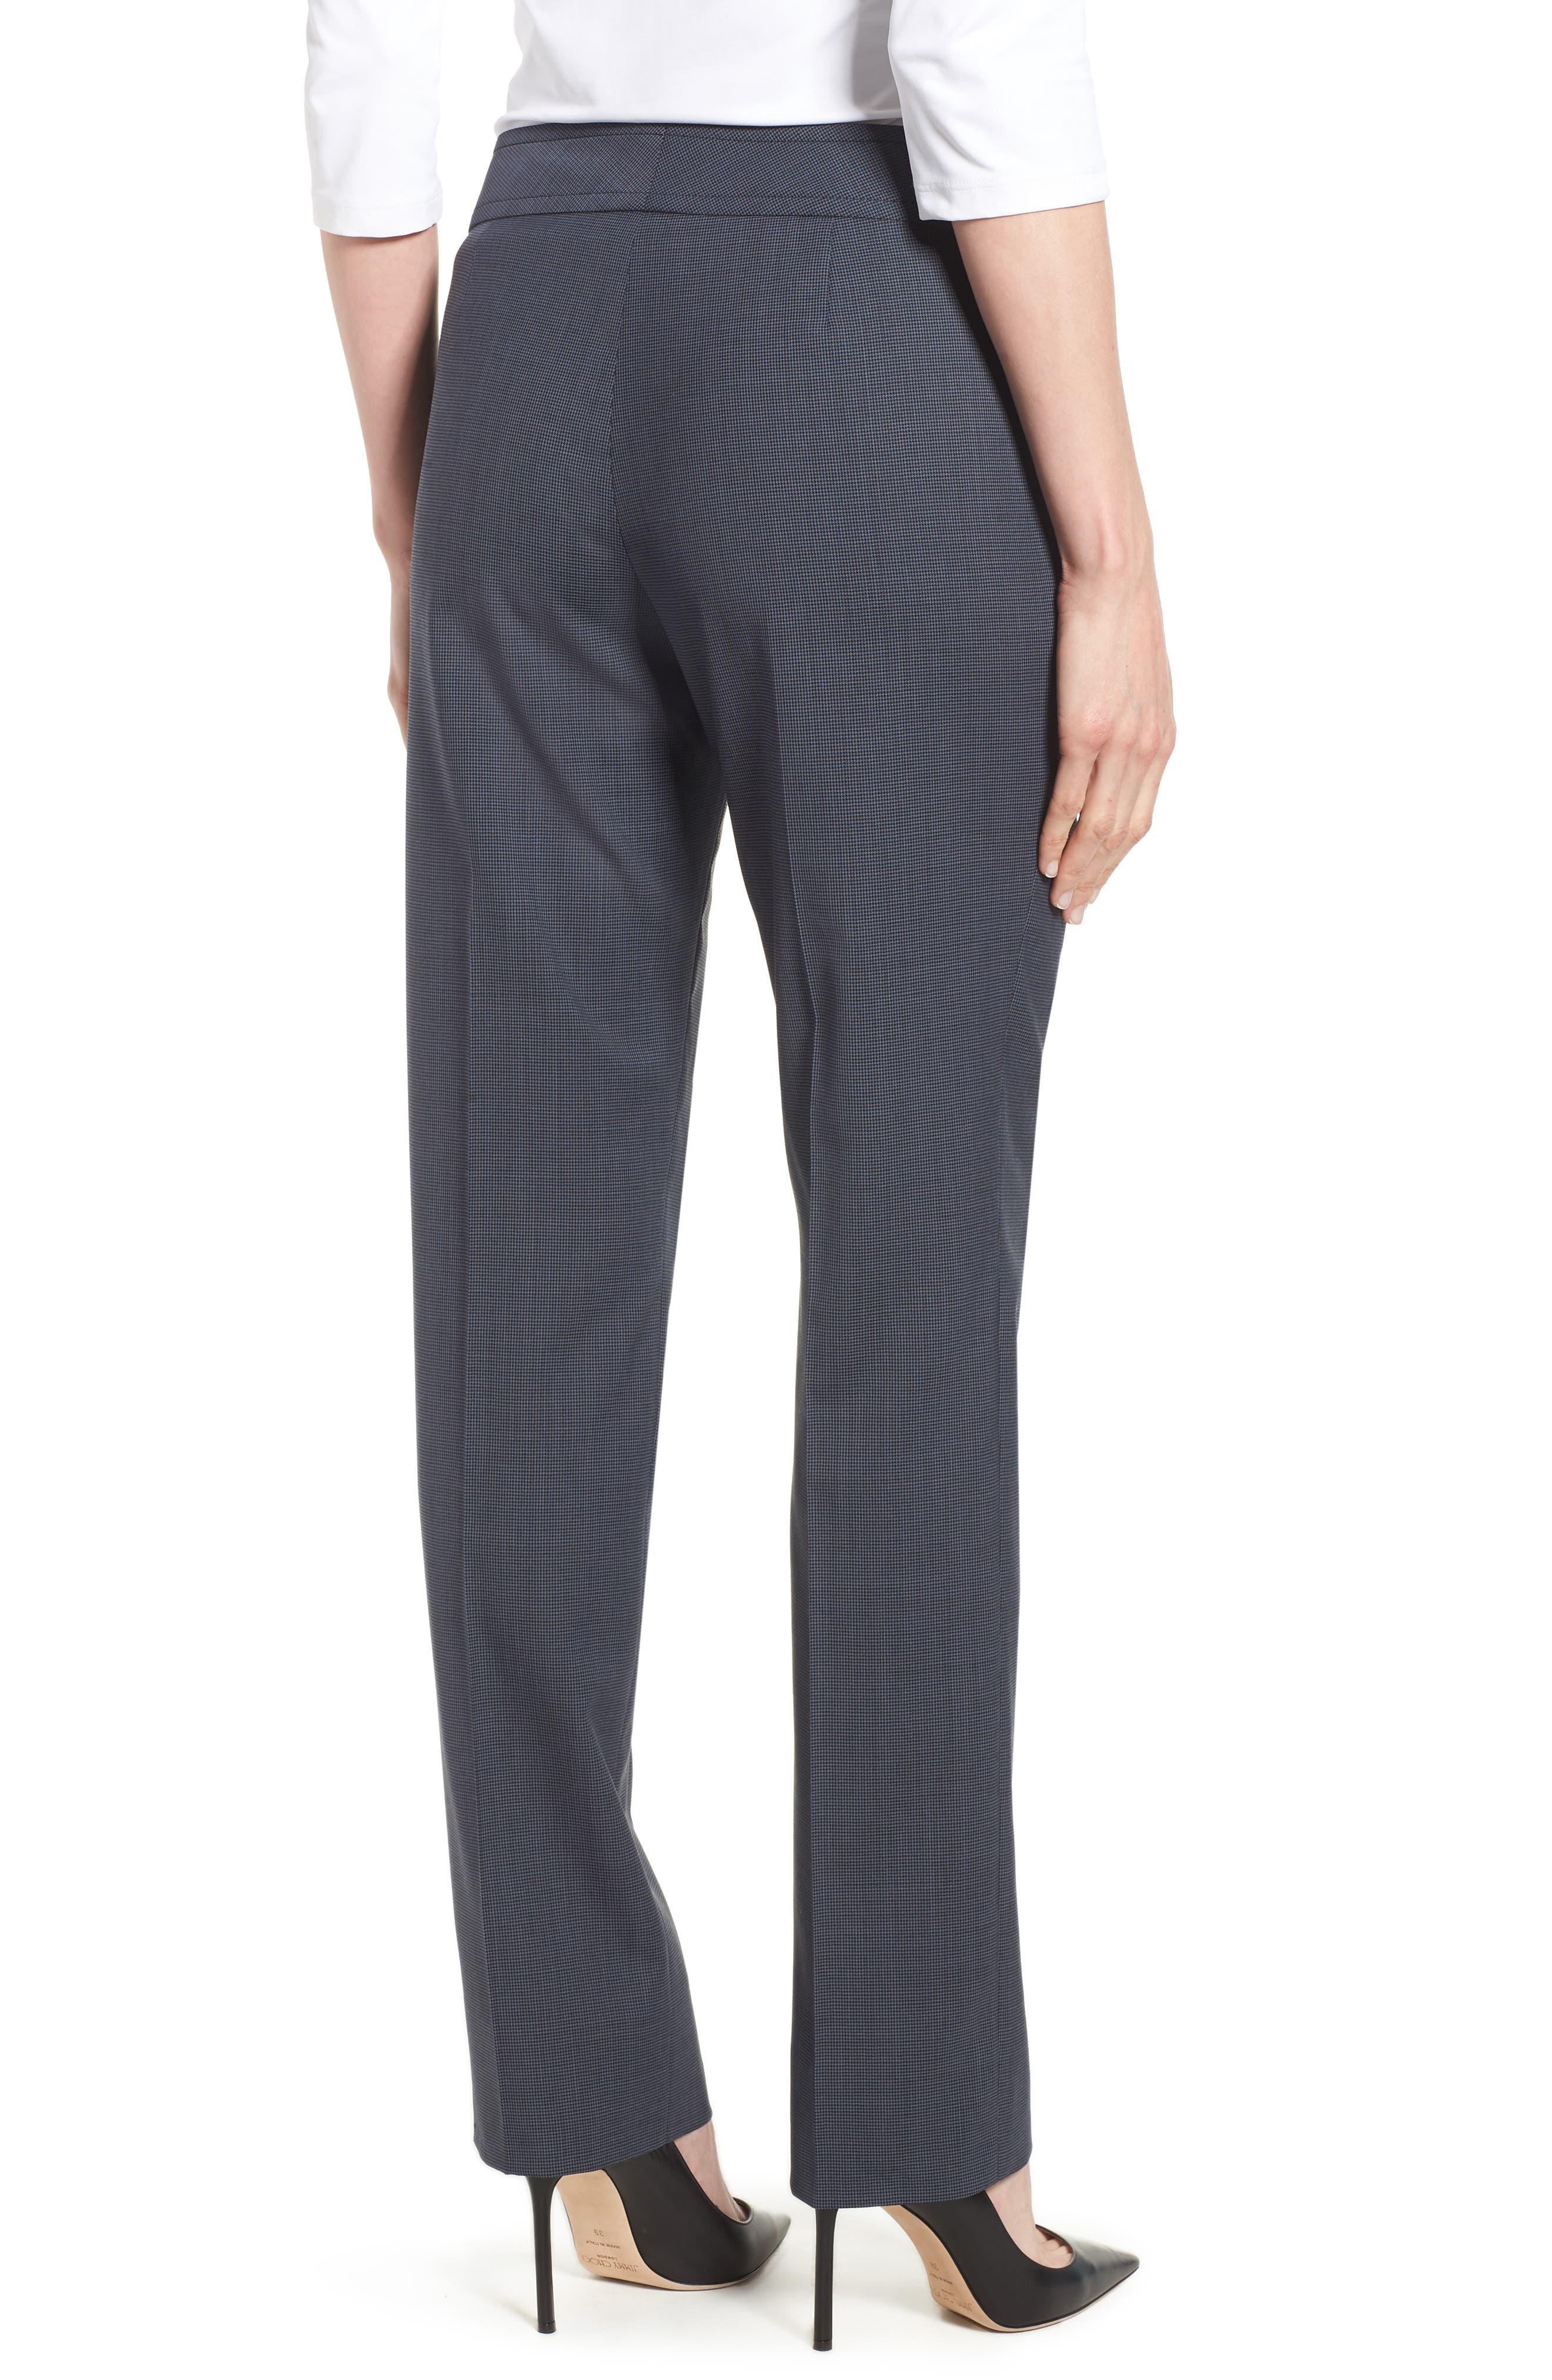 Talouise Pepita Stretch Wool Suit Pants,                             Alternate thumbnail 2, color,                             462